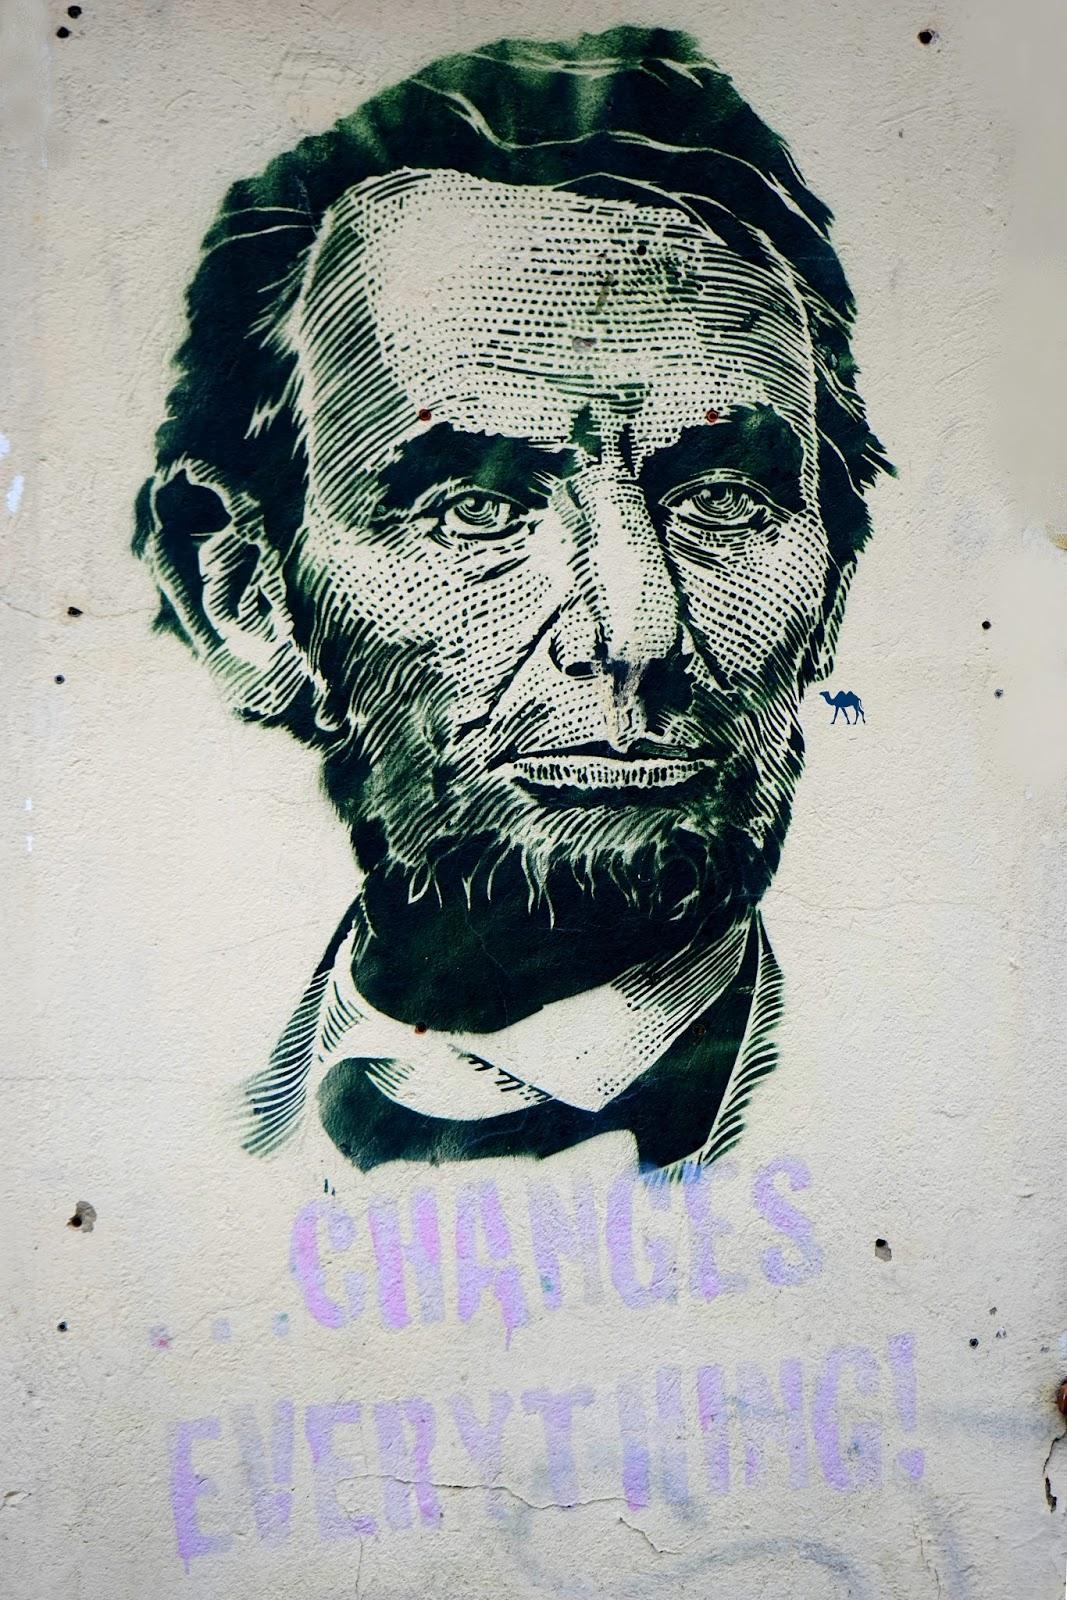 Le Chameau Bleu - Street art Berlinois - Abraham Lincoln